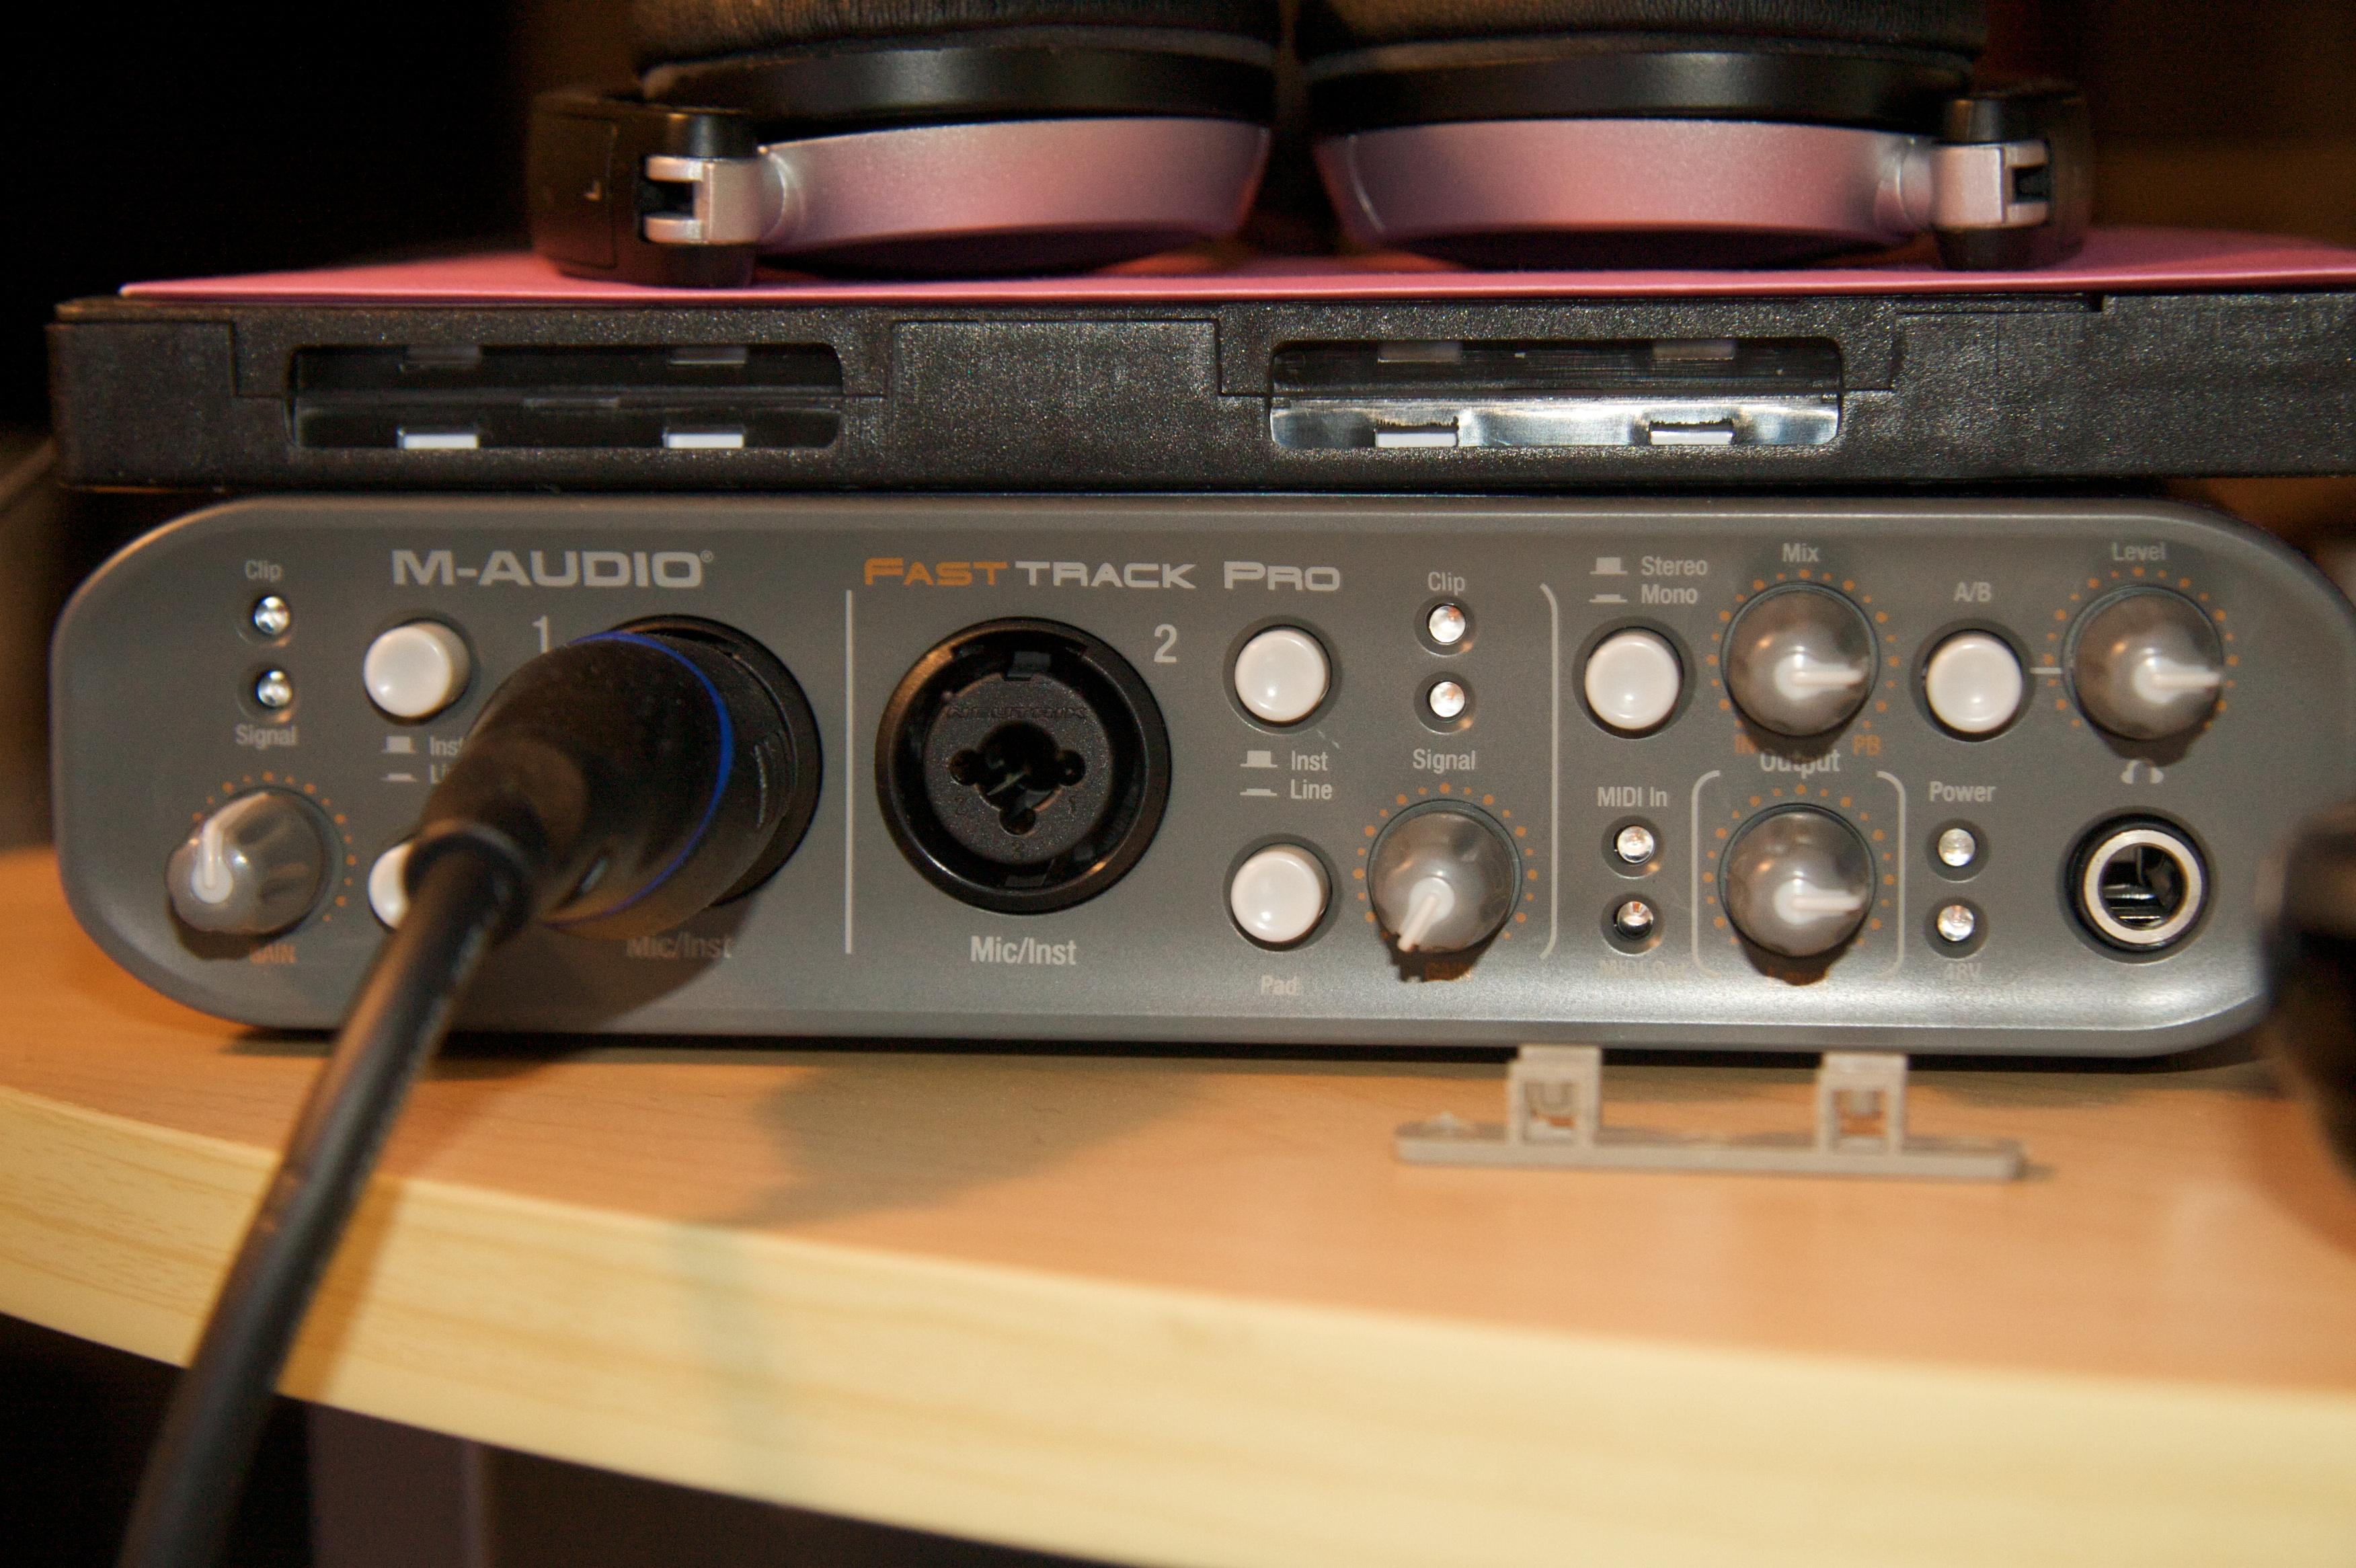 M audio fast track pro инструкция